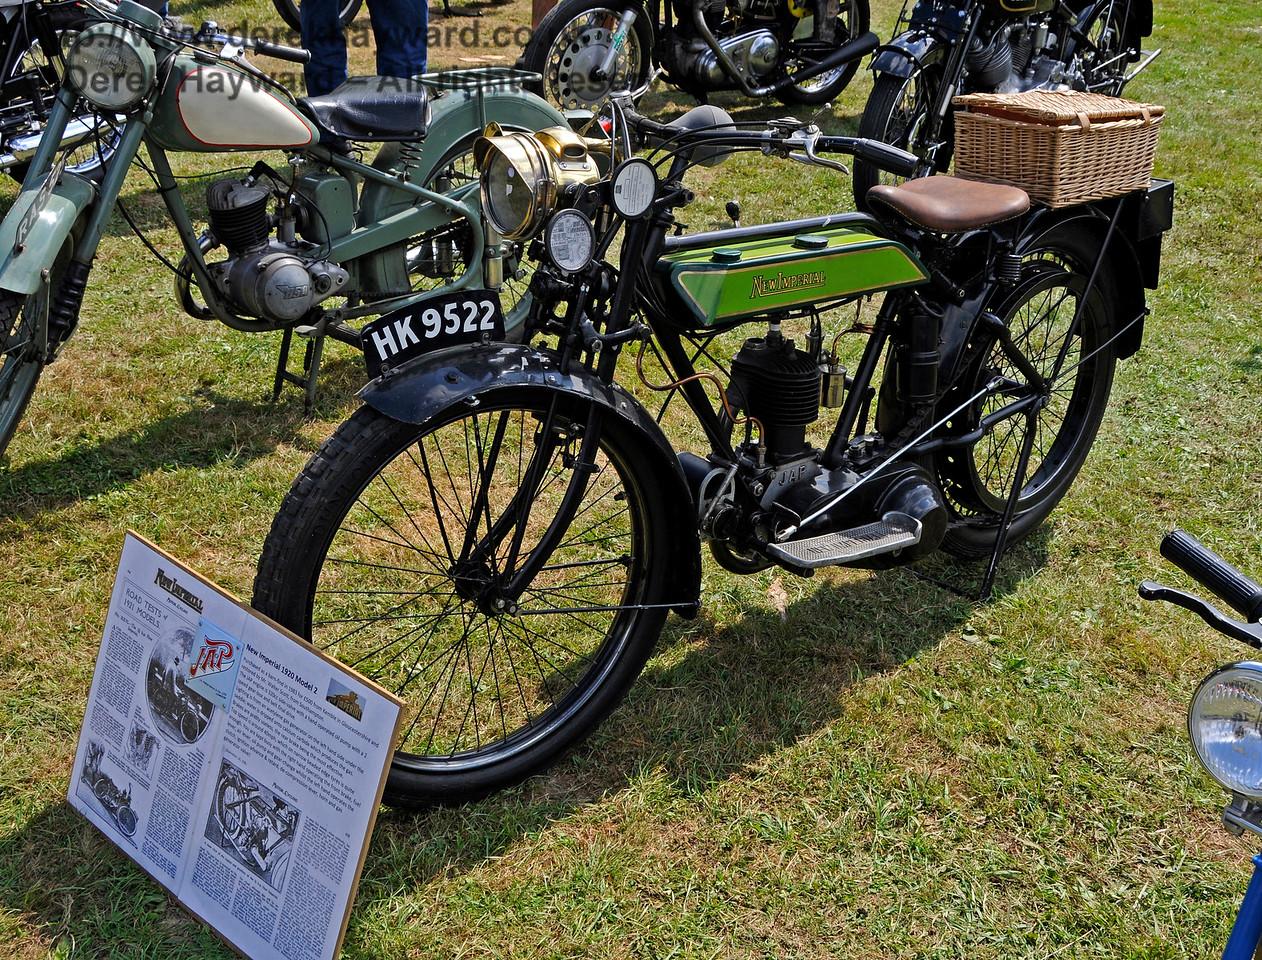 Best Pre-War Motor Cycle was a New Imperial, HK9522, owned by Peter Scott.  Vintage Transport Weekend, Horsted Keynes, 14.08.2016  16177